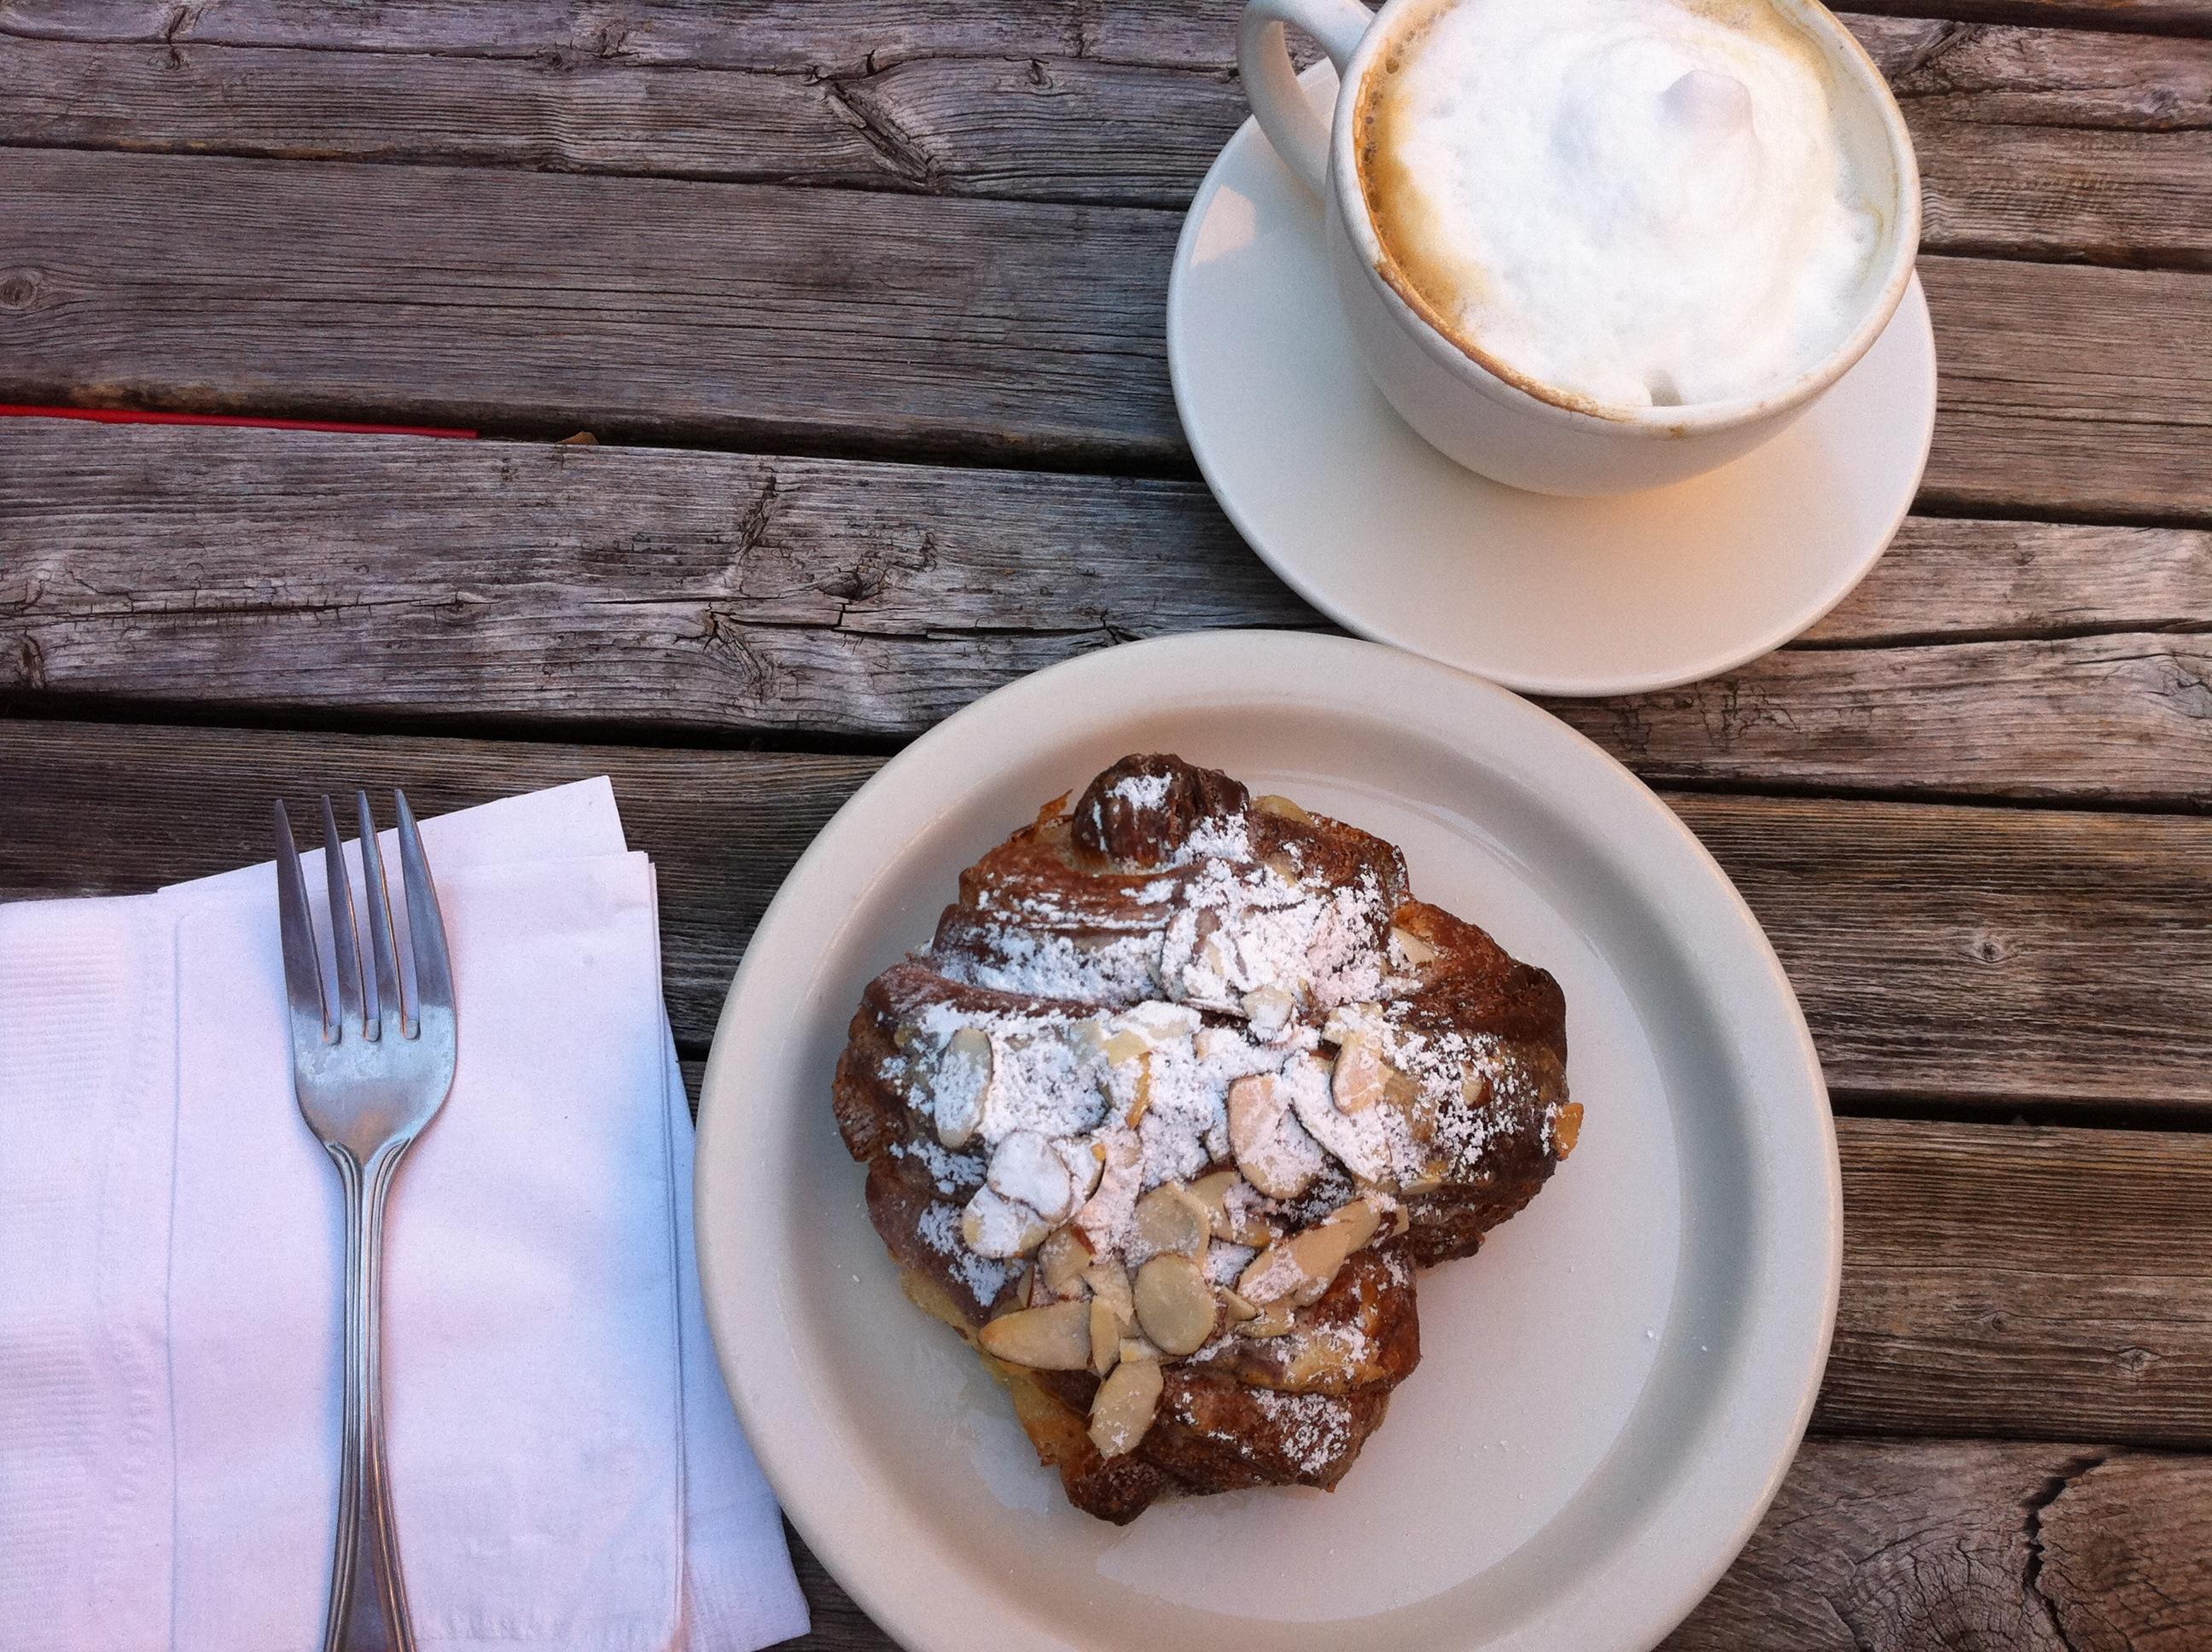 Tulie Bakery Almond Croissant